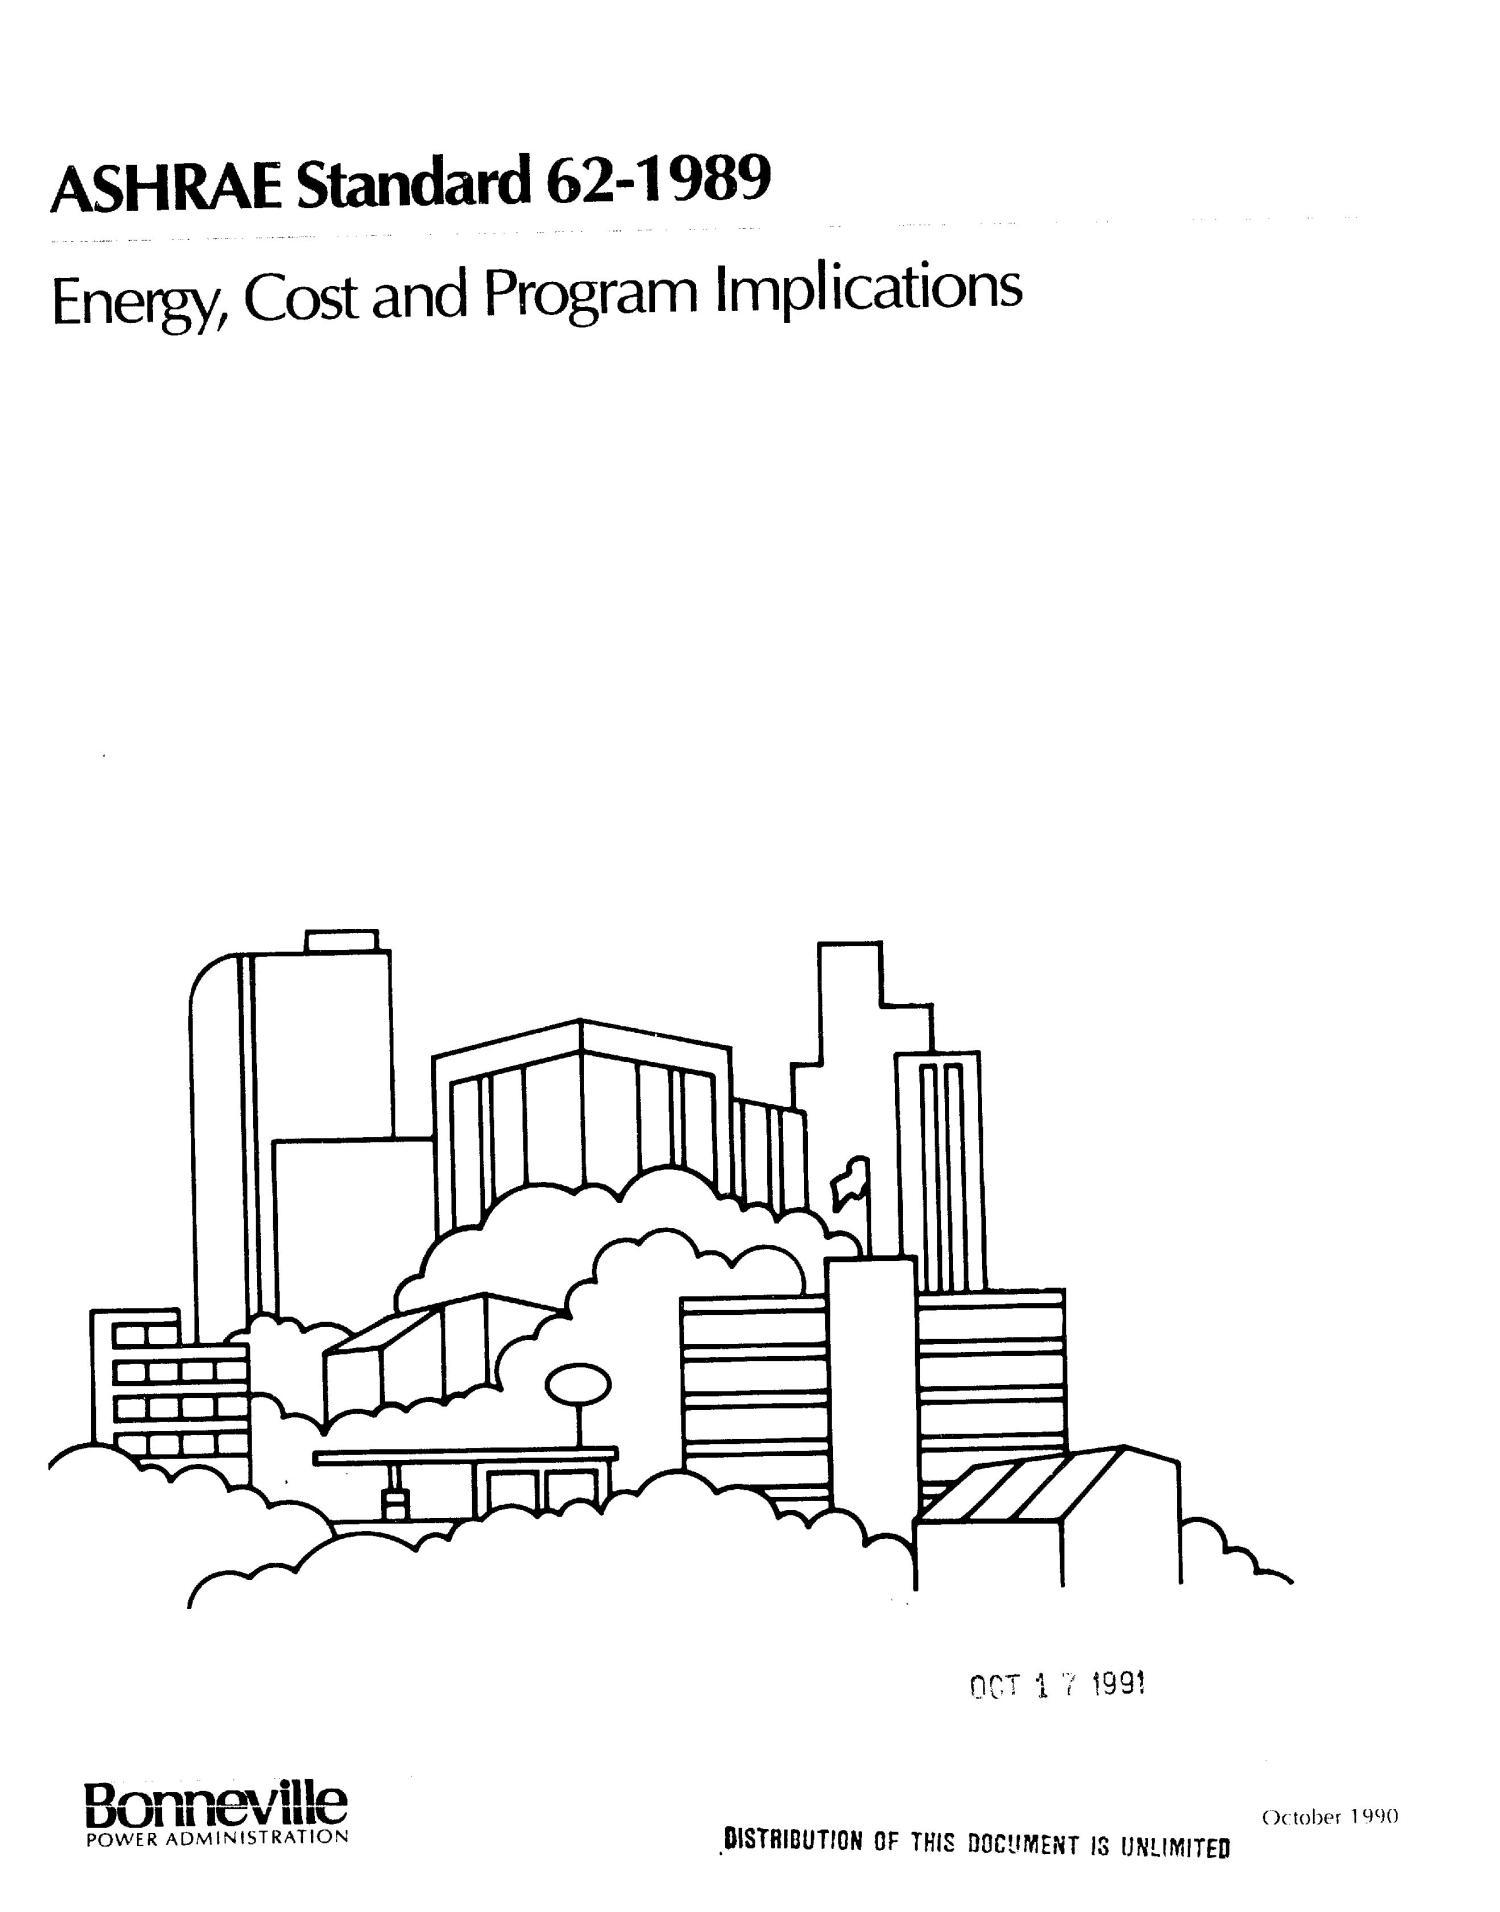 ASHRAE Standard 62-1989: Energy, Cost, and Program